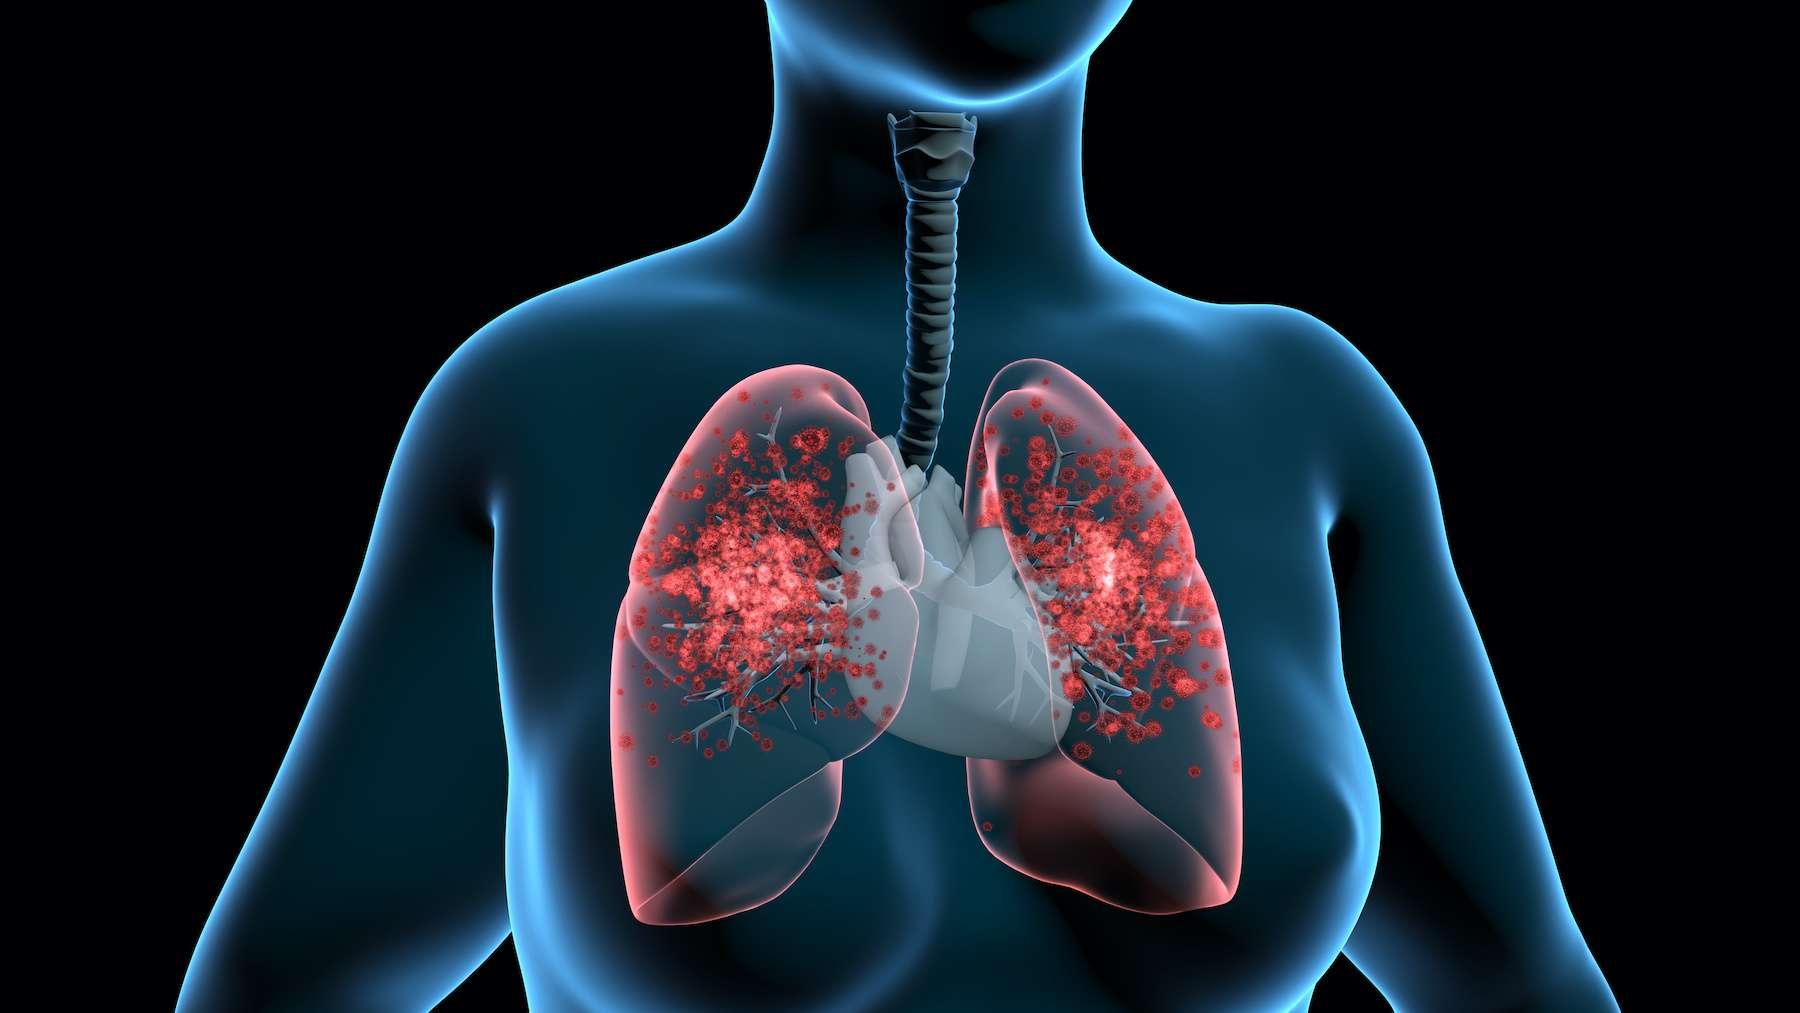 Le SARS-CoV-2 peut être transmis via une transplantation pulmonaire. © TuMeggy, Adobe Stock